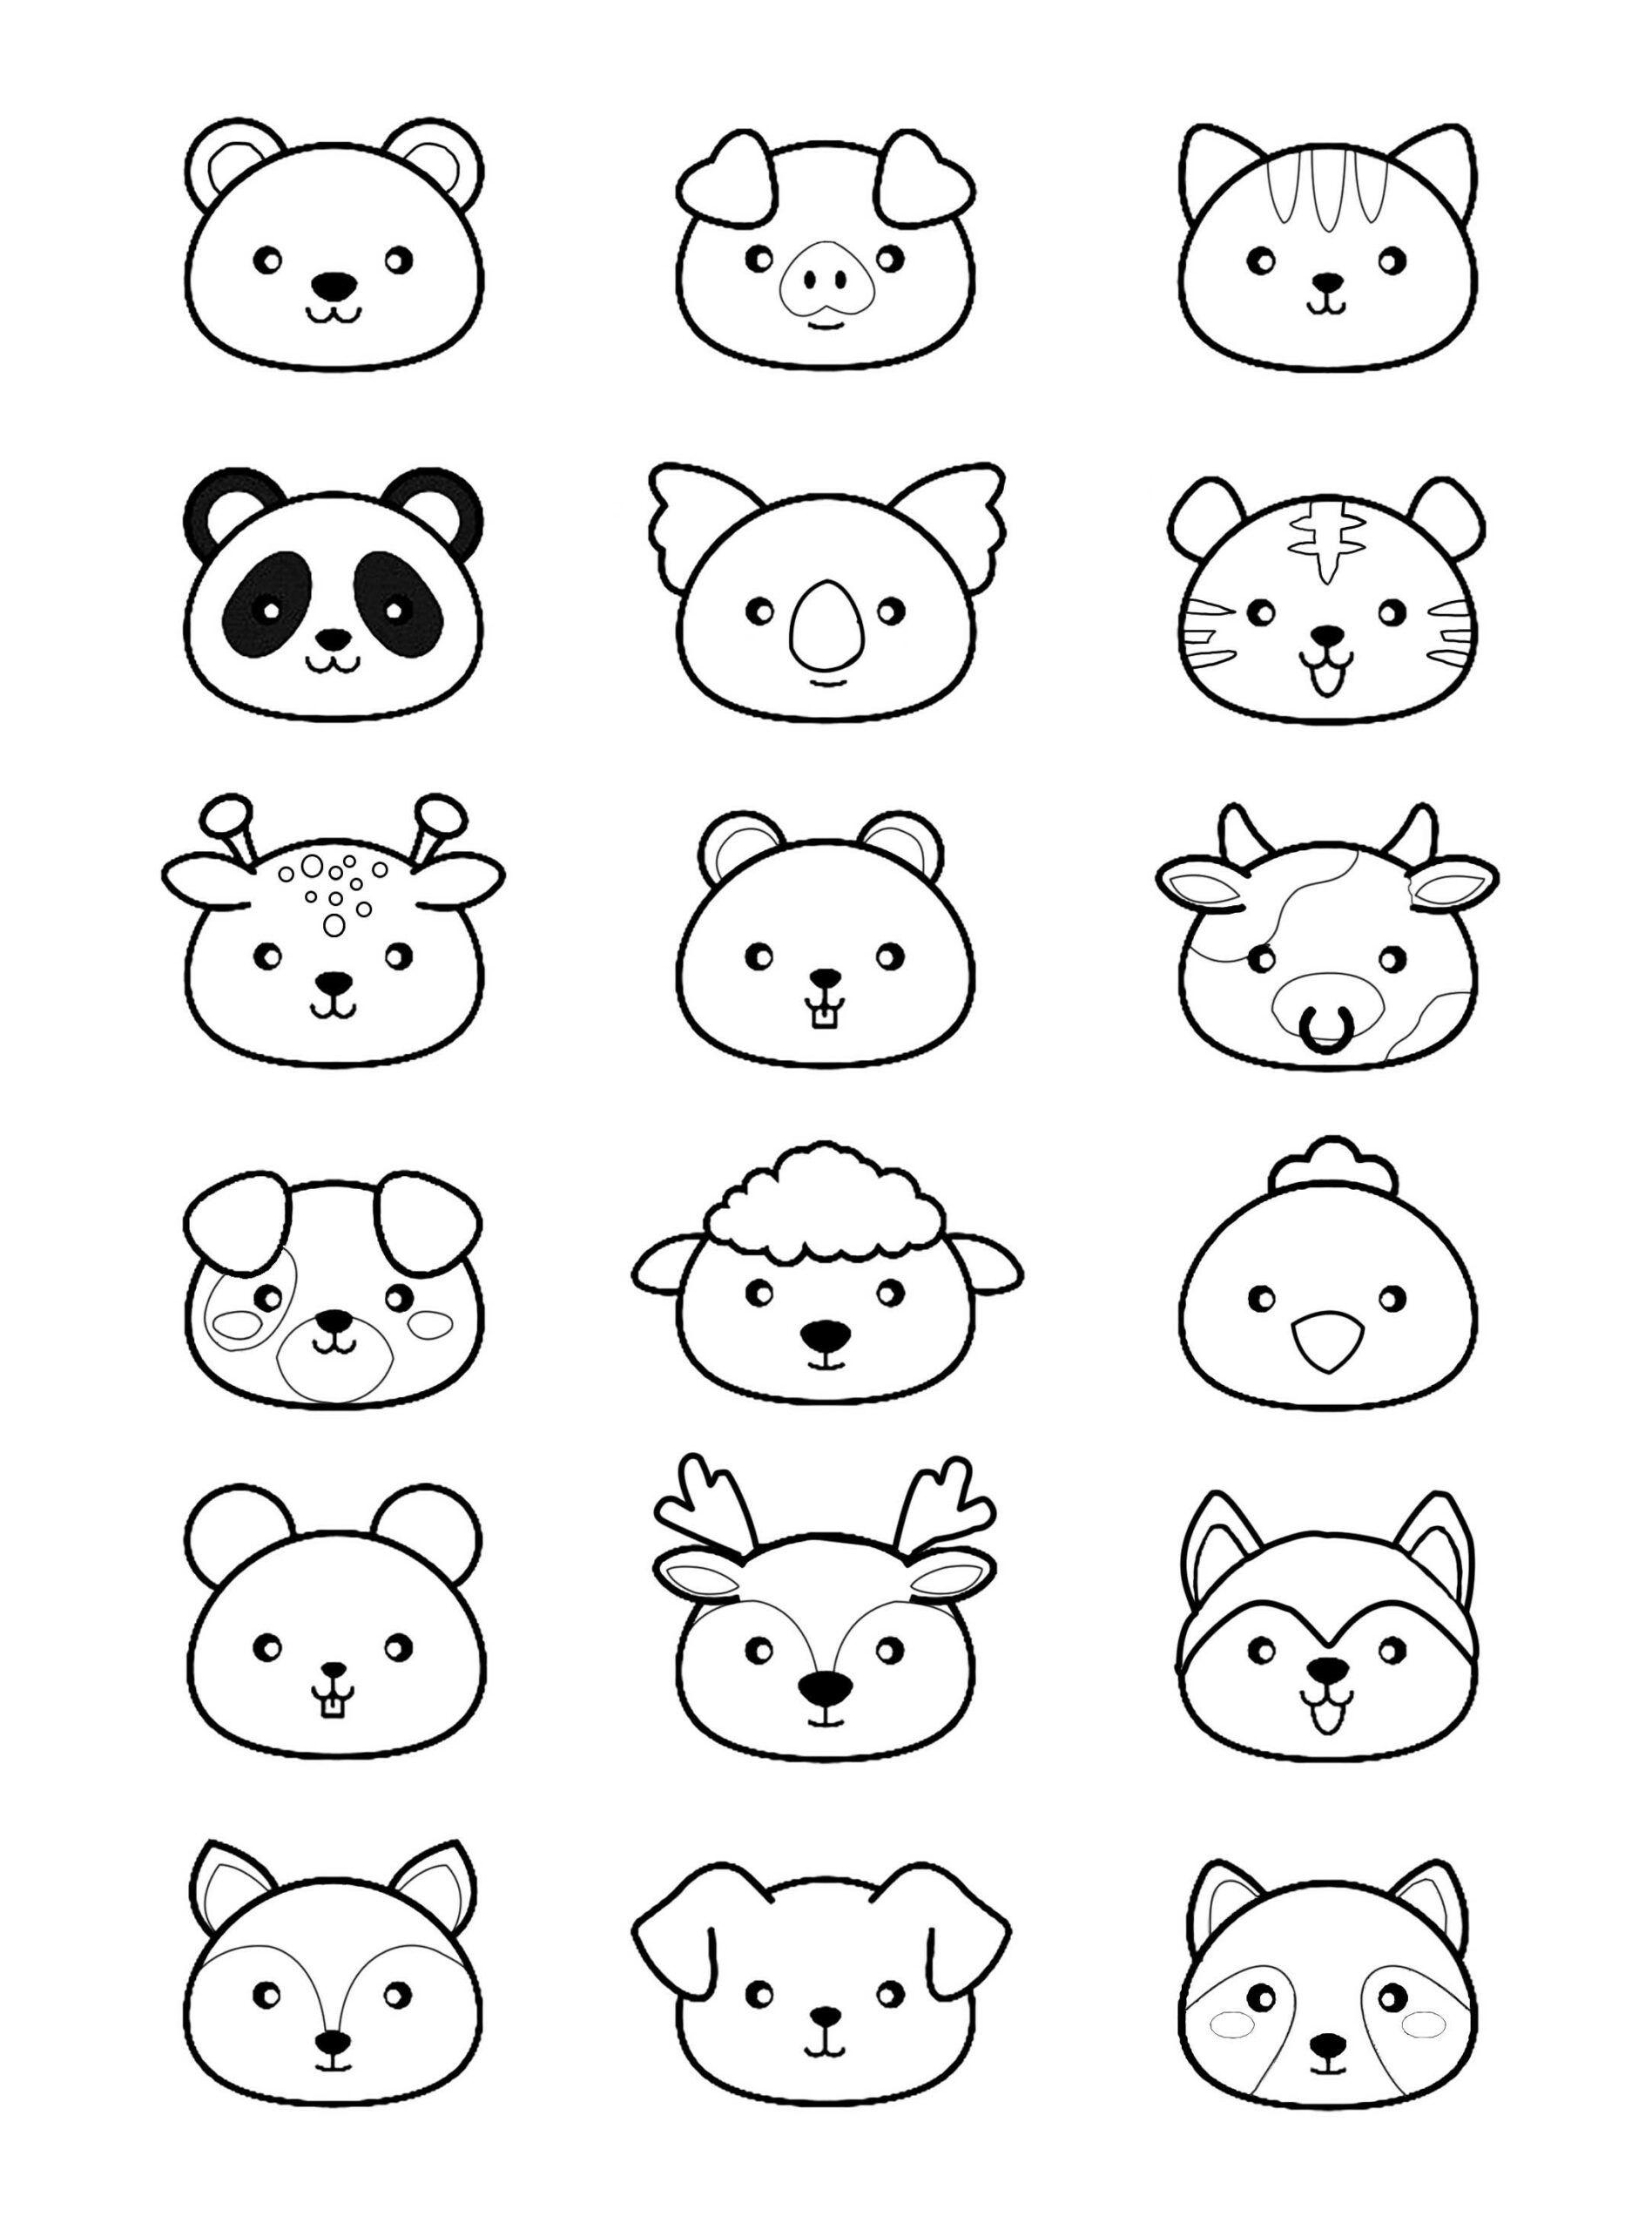 Cose Da Colorare Bello Panda Panda Disegni Da Colorare Per Adulti Of Cose Da Colorare Cose Da Nel 2020 Scarabocchi Kawaii Doodles Carini Disegni Semplici